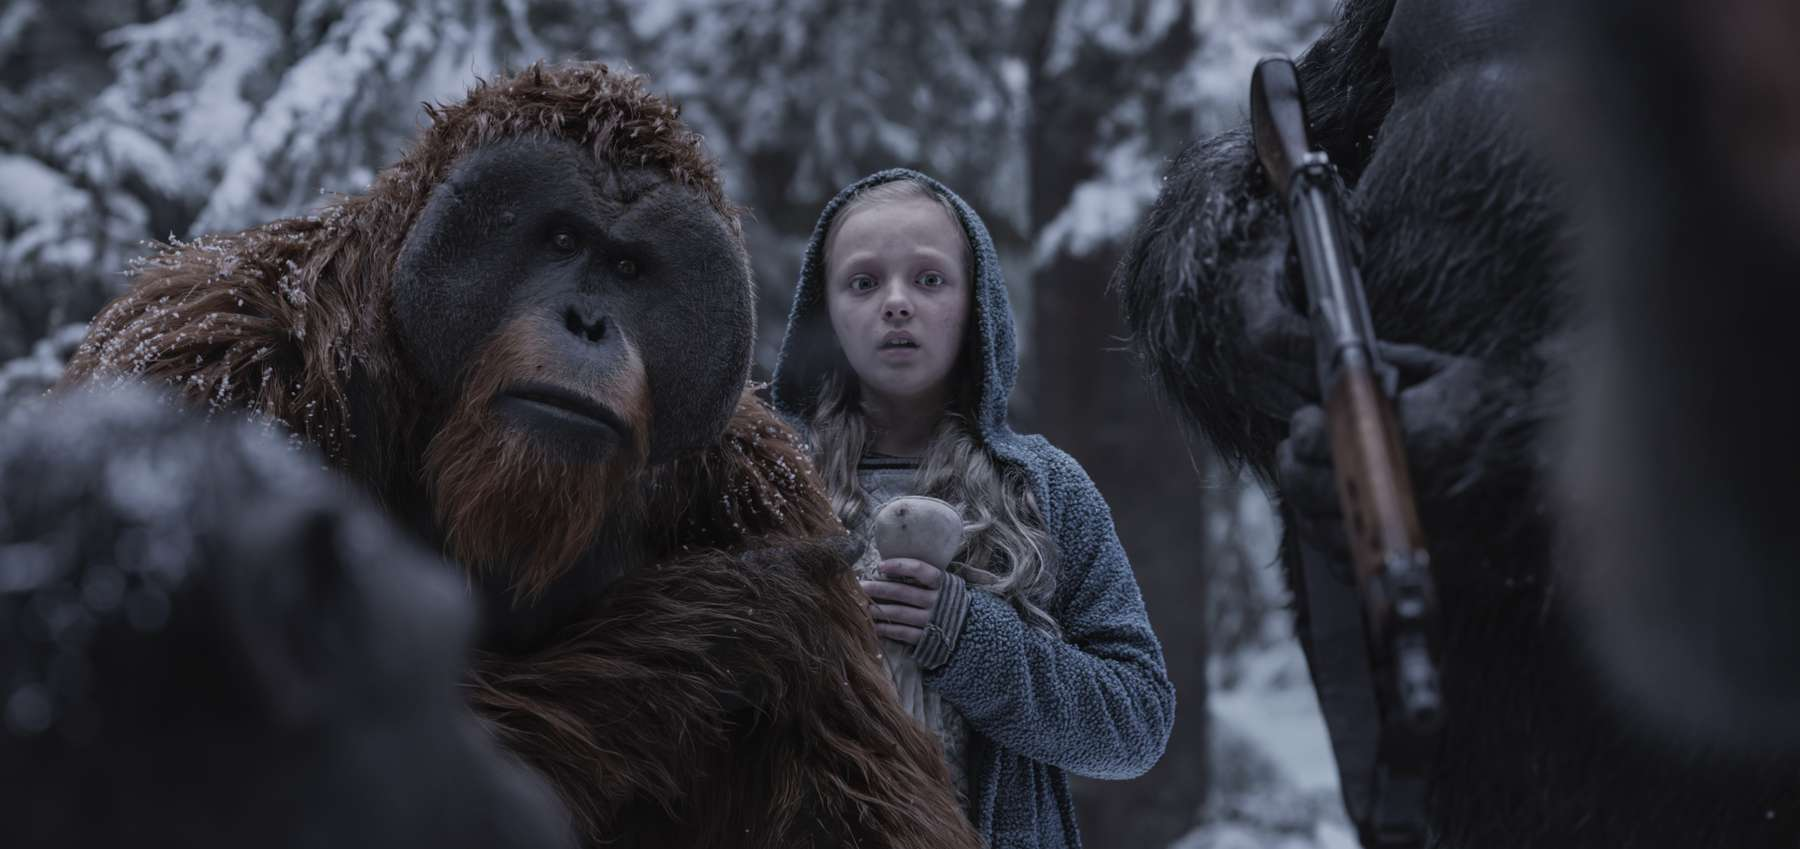 Amiah Miller interpreta Nova, garota que acompanha Cesar e companheiros nas aventuras